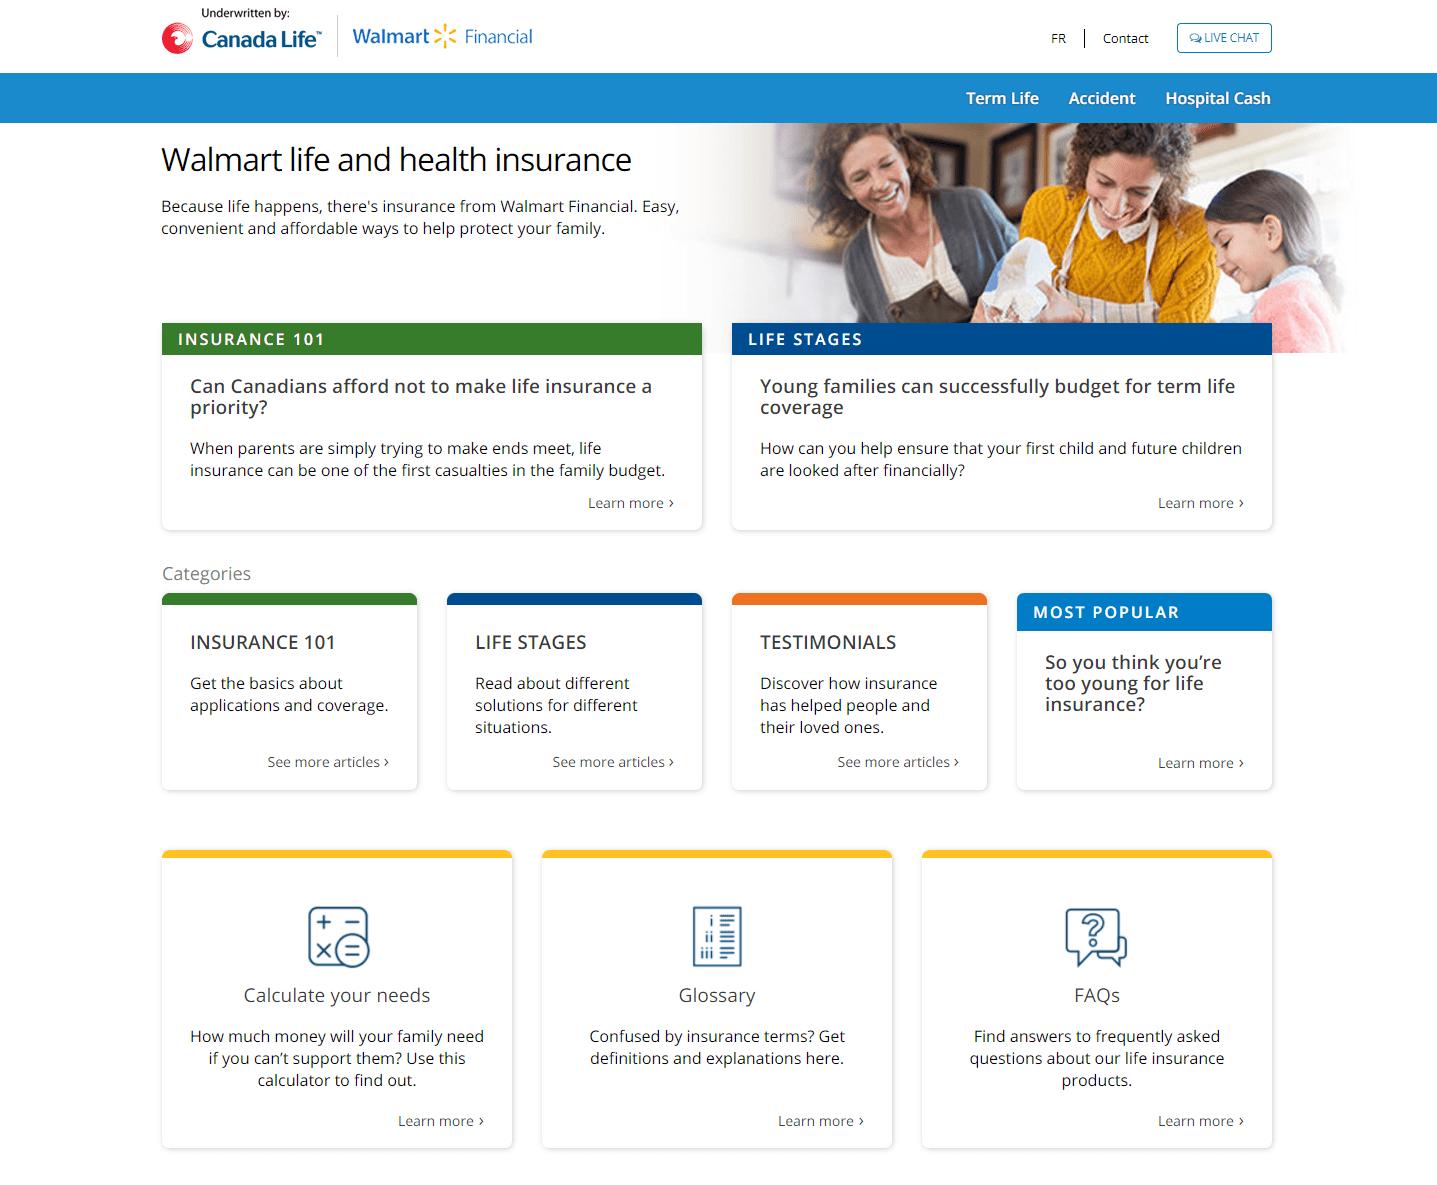 canadalifeinsure.ca Walmart